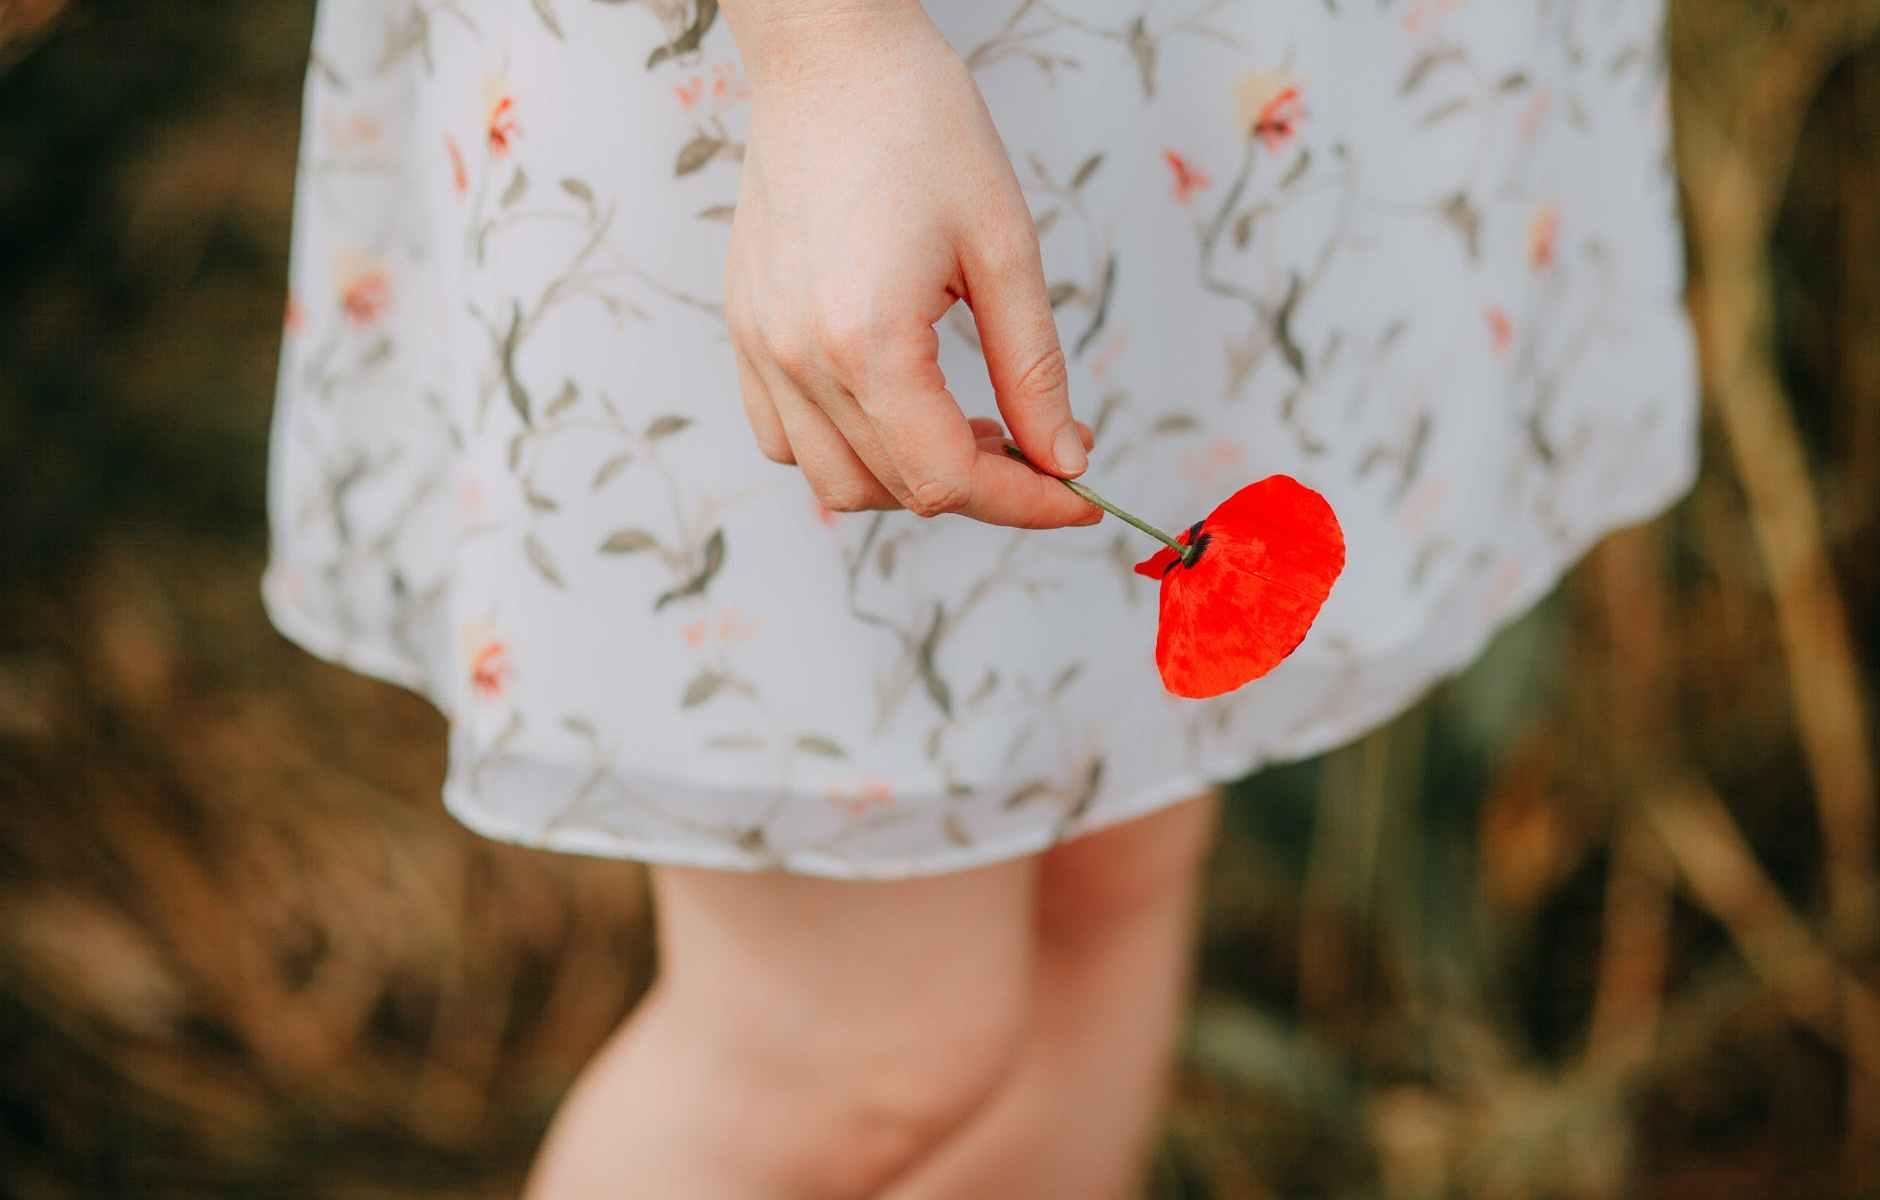 mano-fiore-papavero-gambe-donna